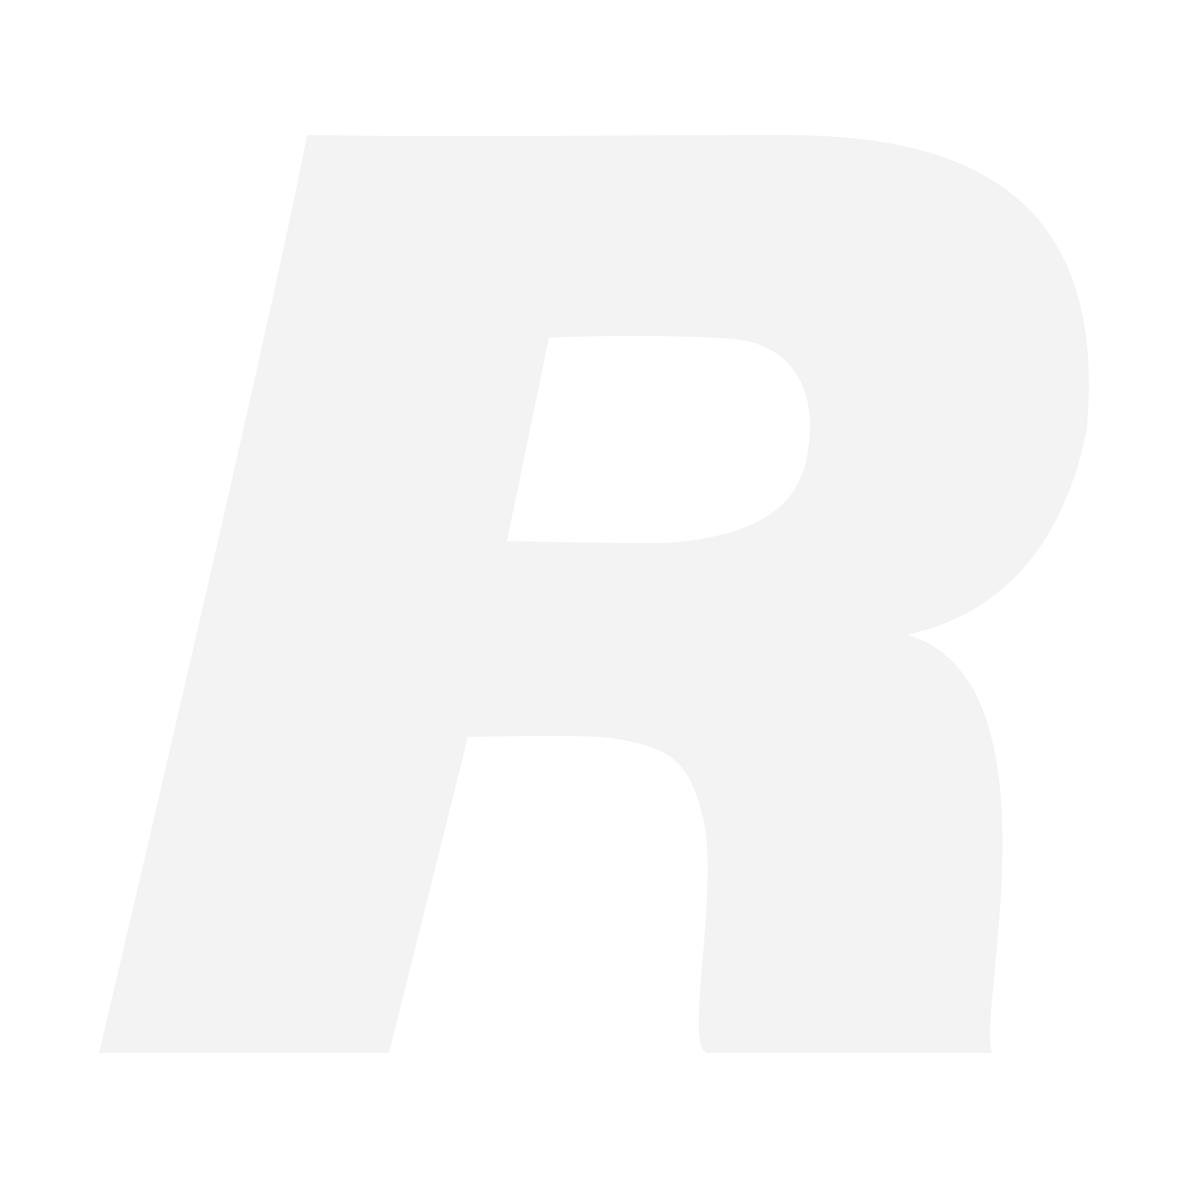 GoPro Hero 7 Black + Lowepro Dashpoint AVC1